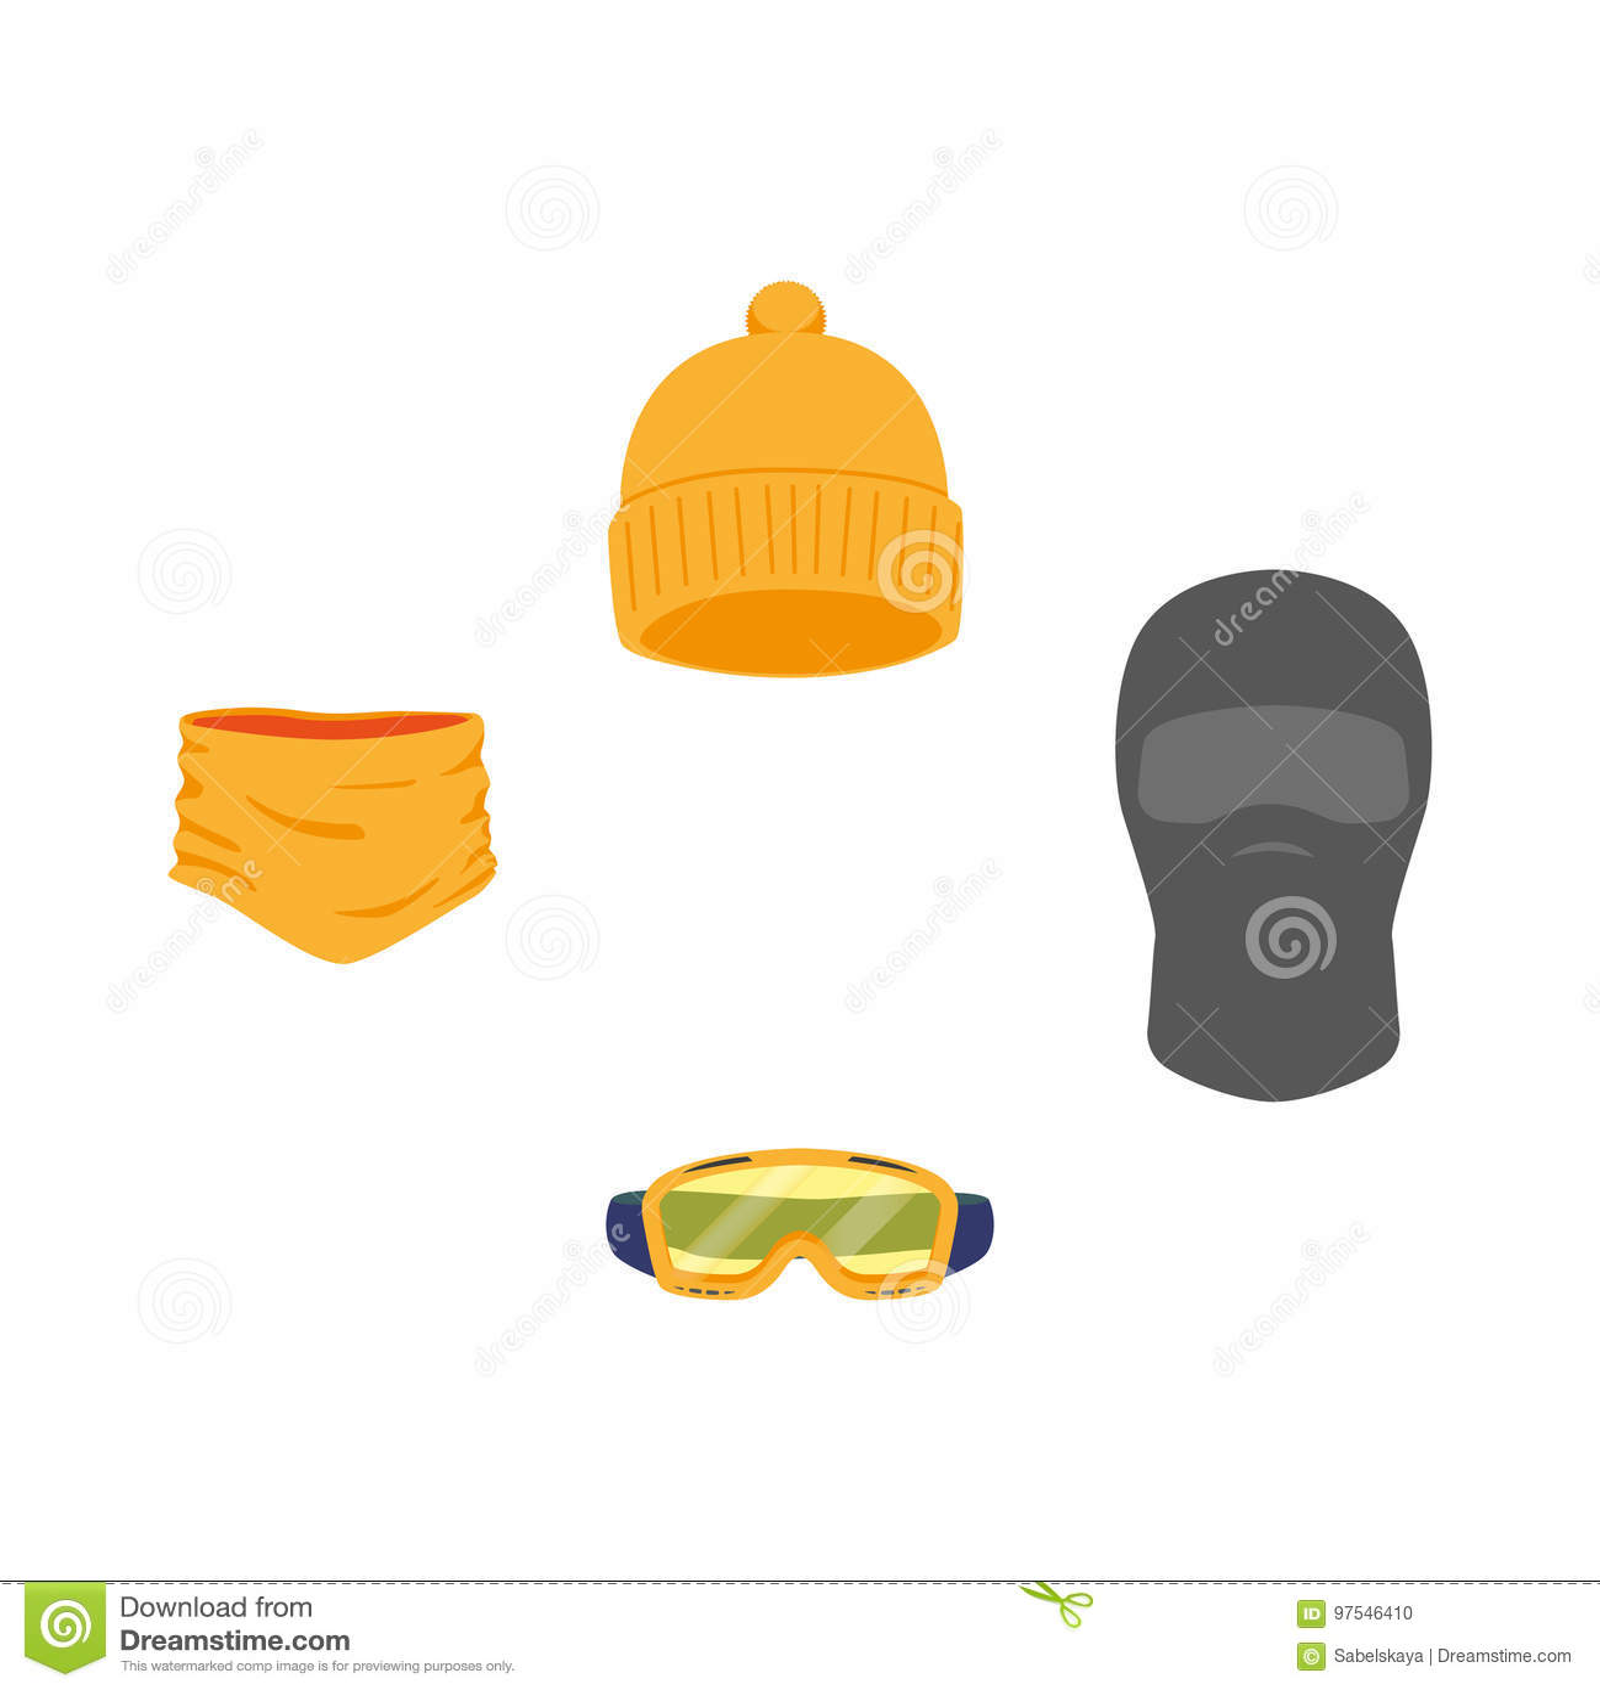 d011288e958 Vector snowboarding equipment set - cap balaclava goggles mask flat icon.  illustration on a white background. Snowboard